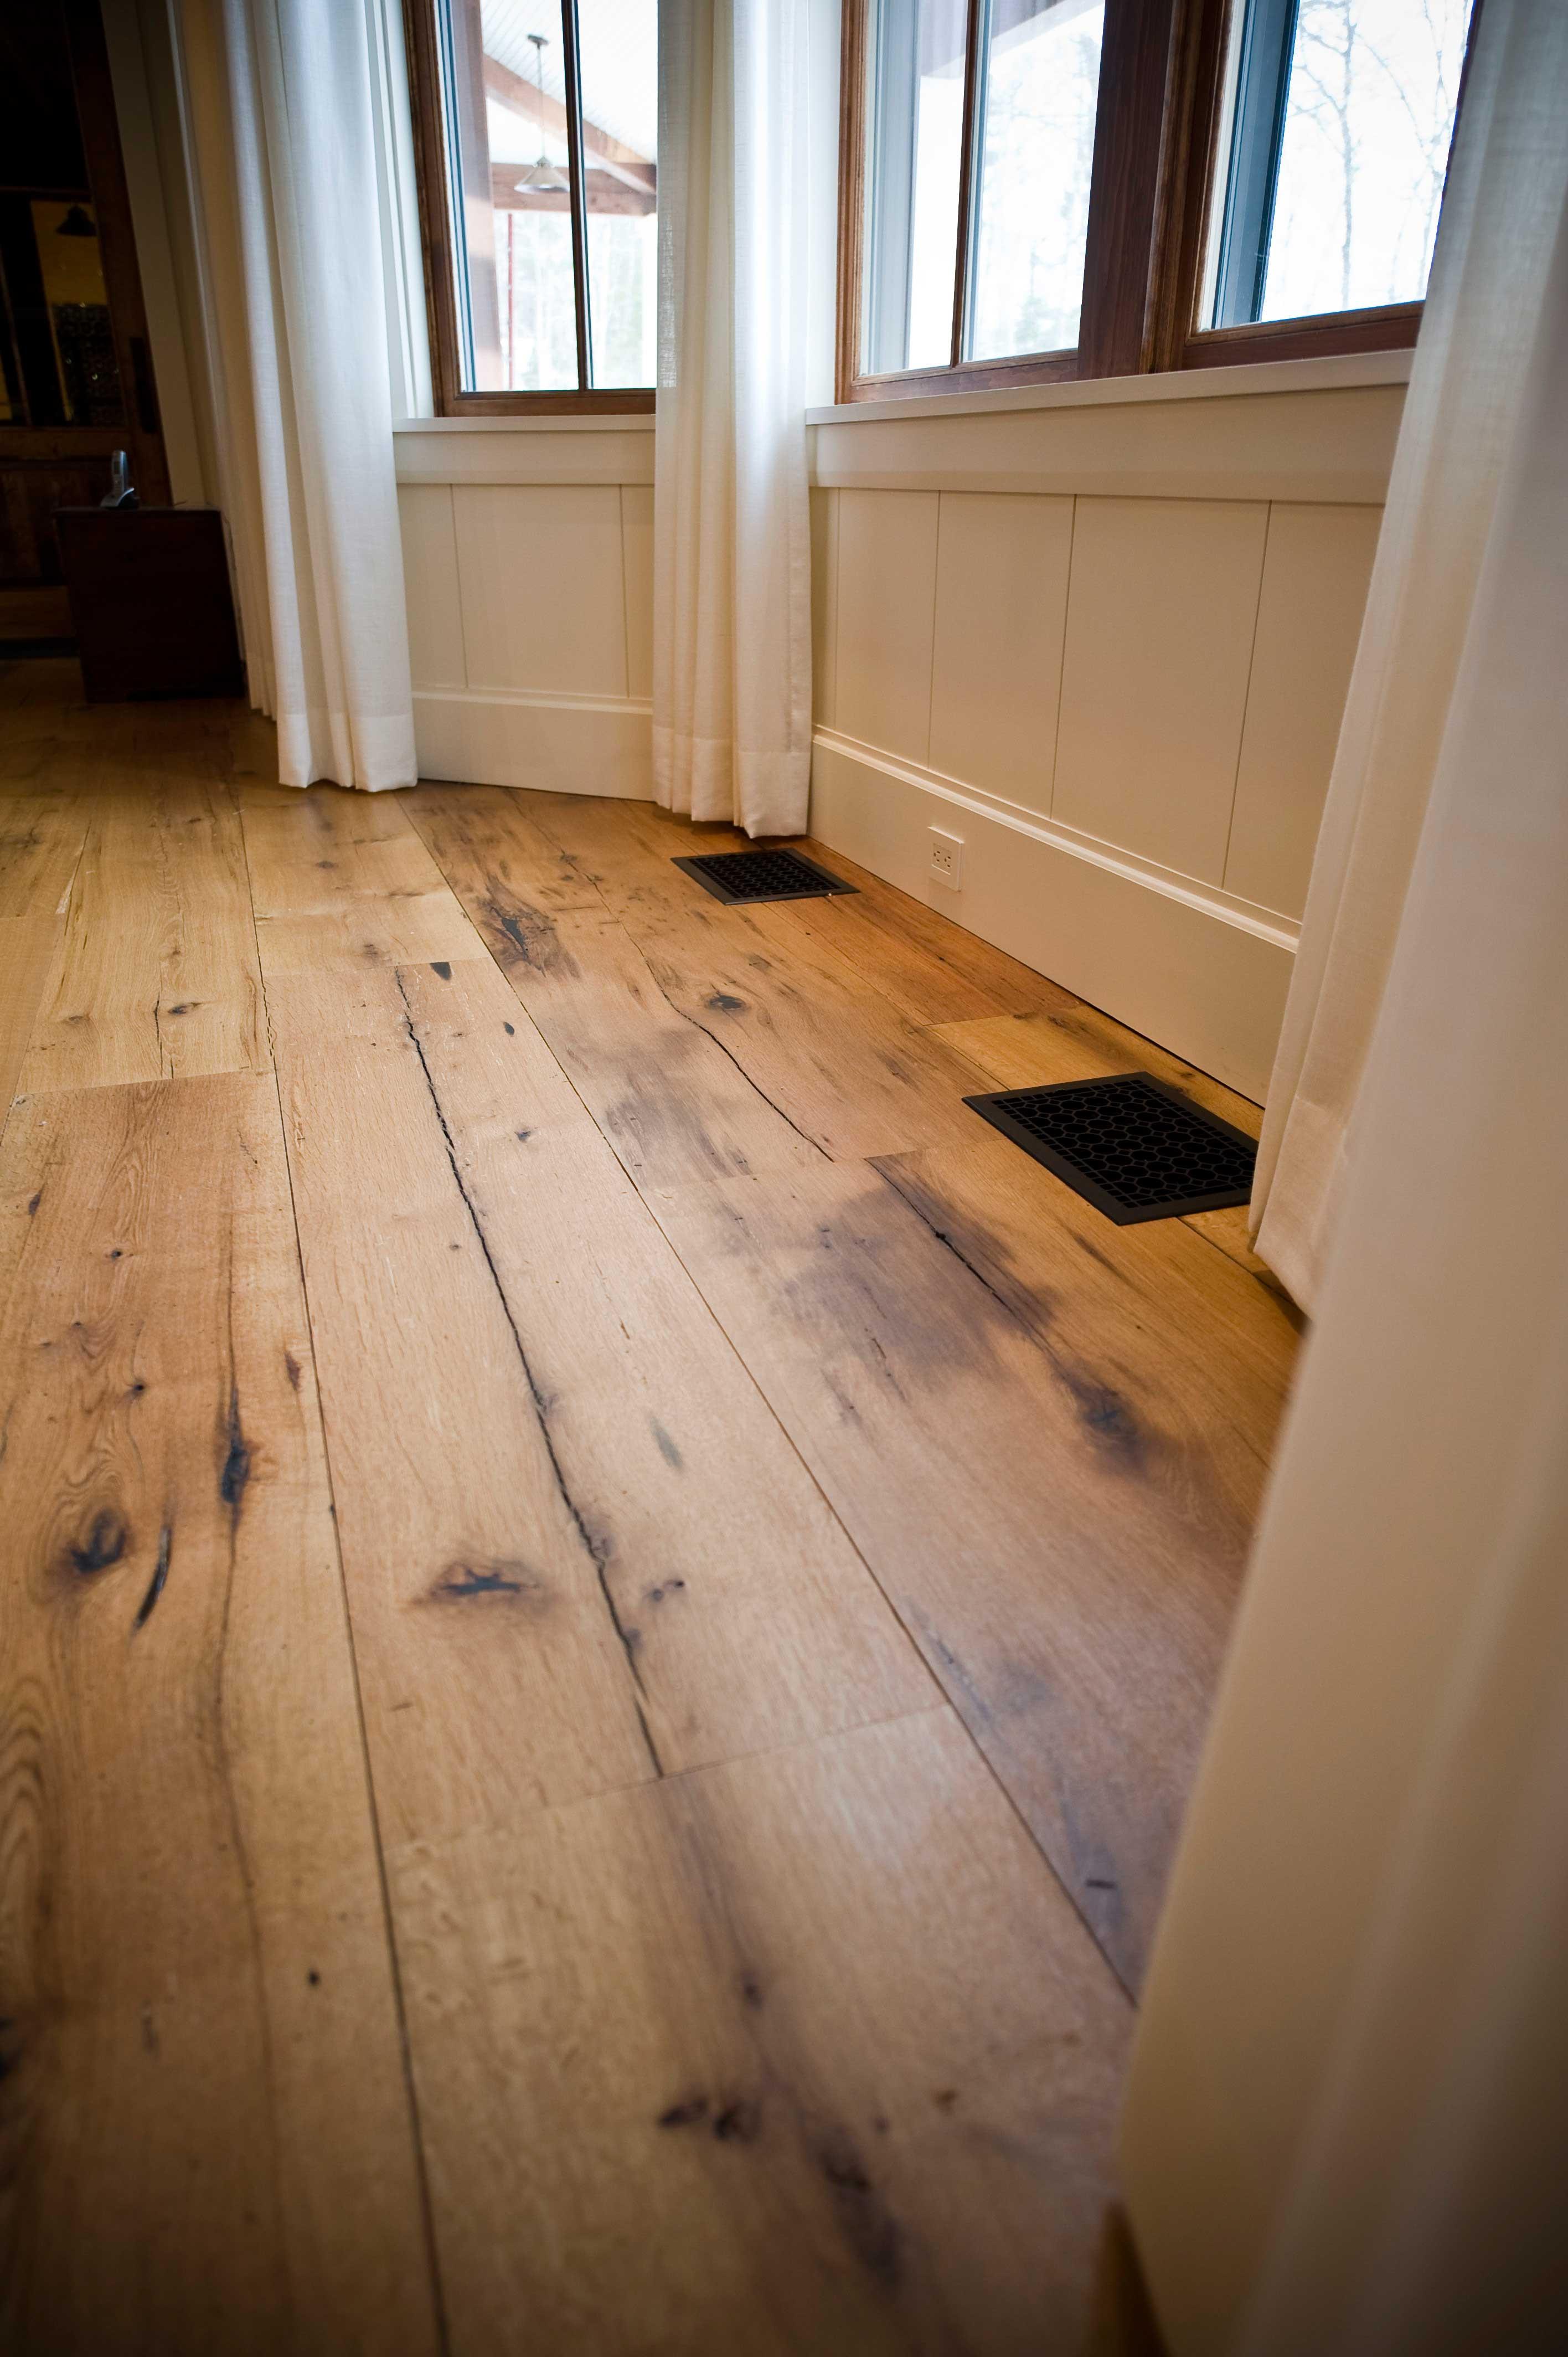 hardwood flooring sale ontario of hardwood flooring deals ontario flooring ideas for floor white pine laminate reclaimed white oak wide plank flooring designs